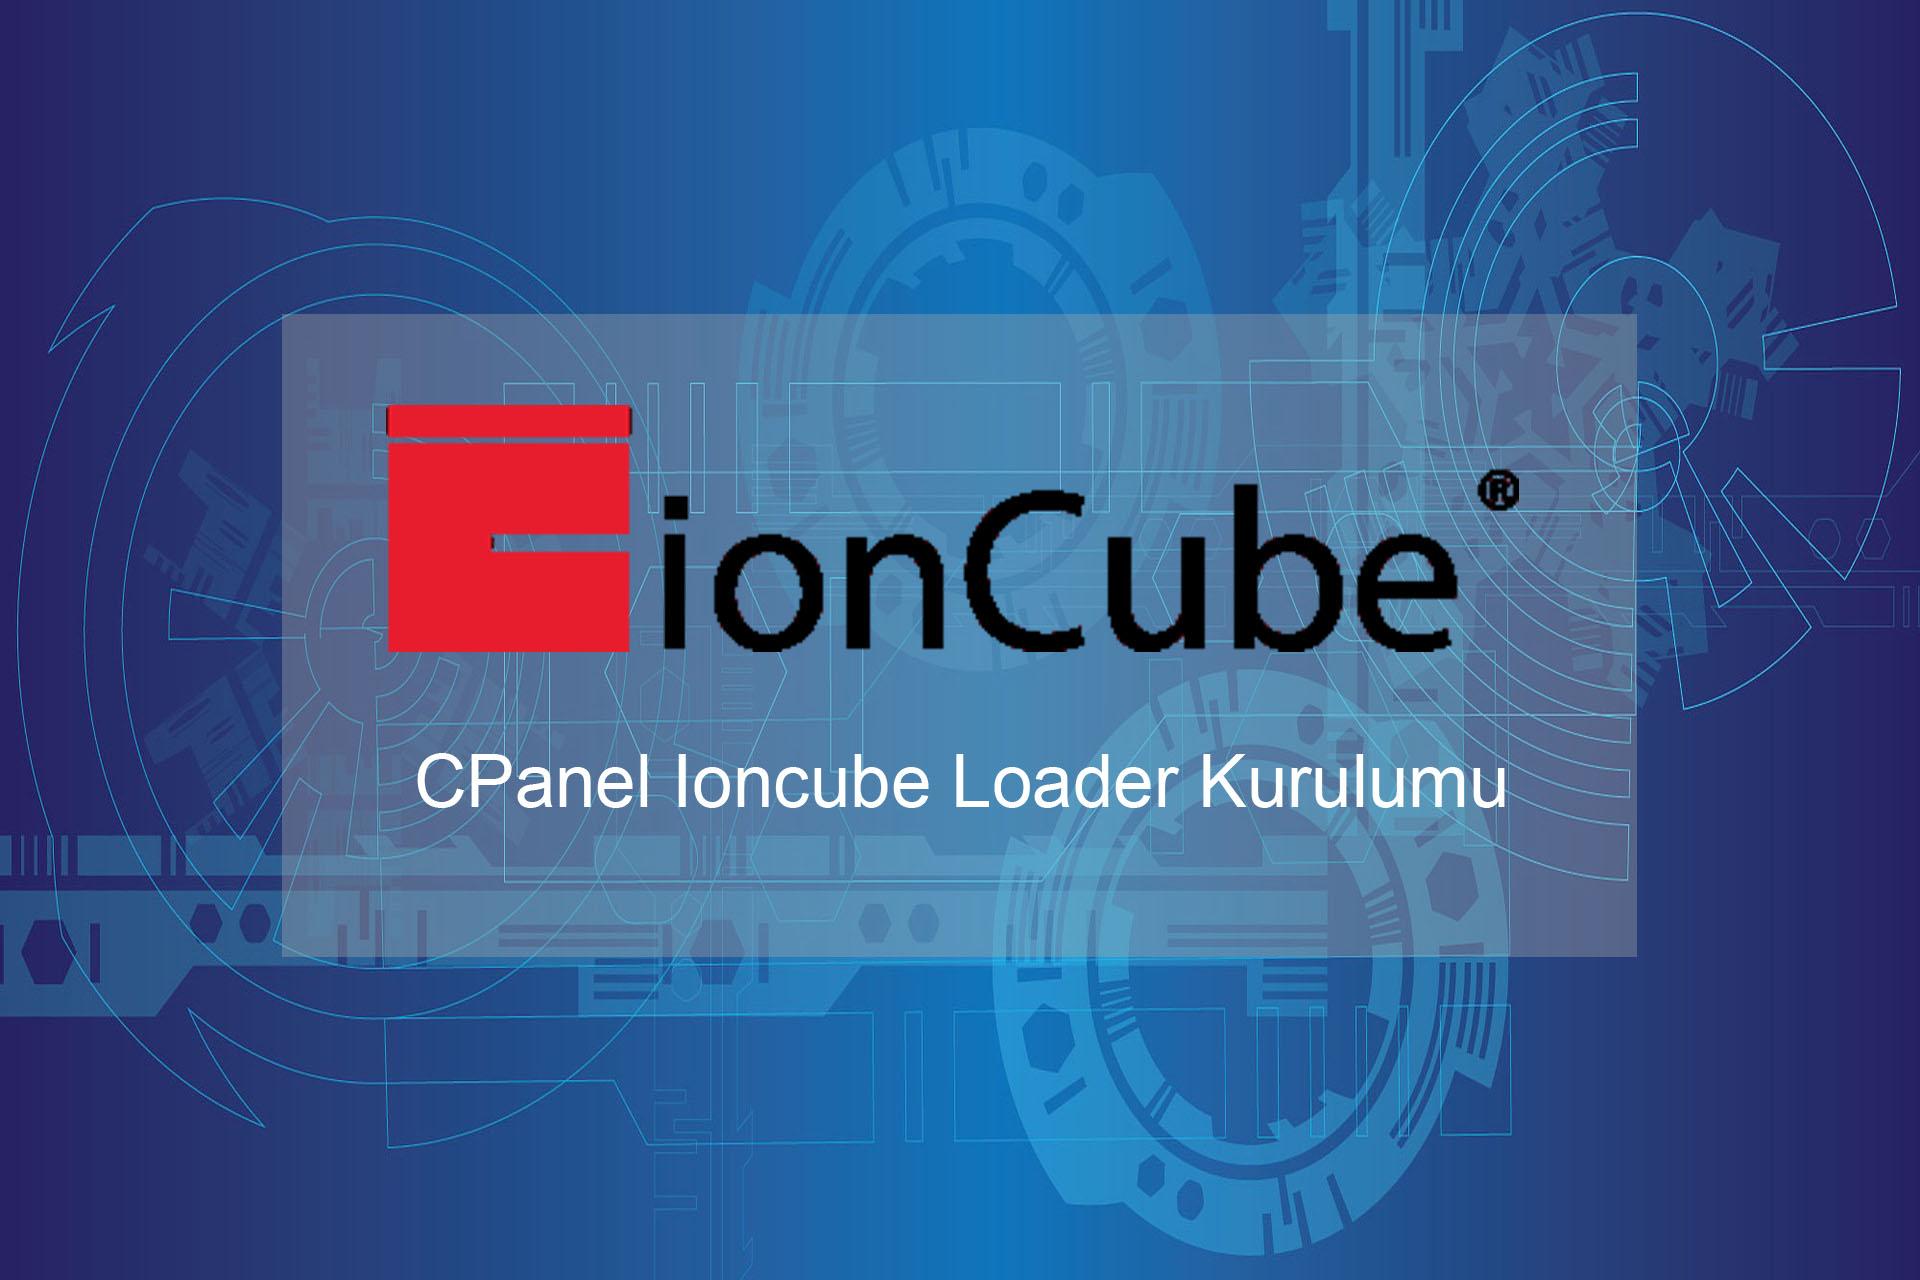 Korumalı: CPanel Ioncube Loader Kurulumu